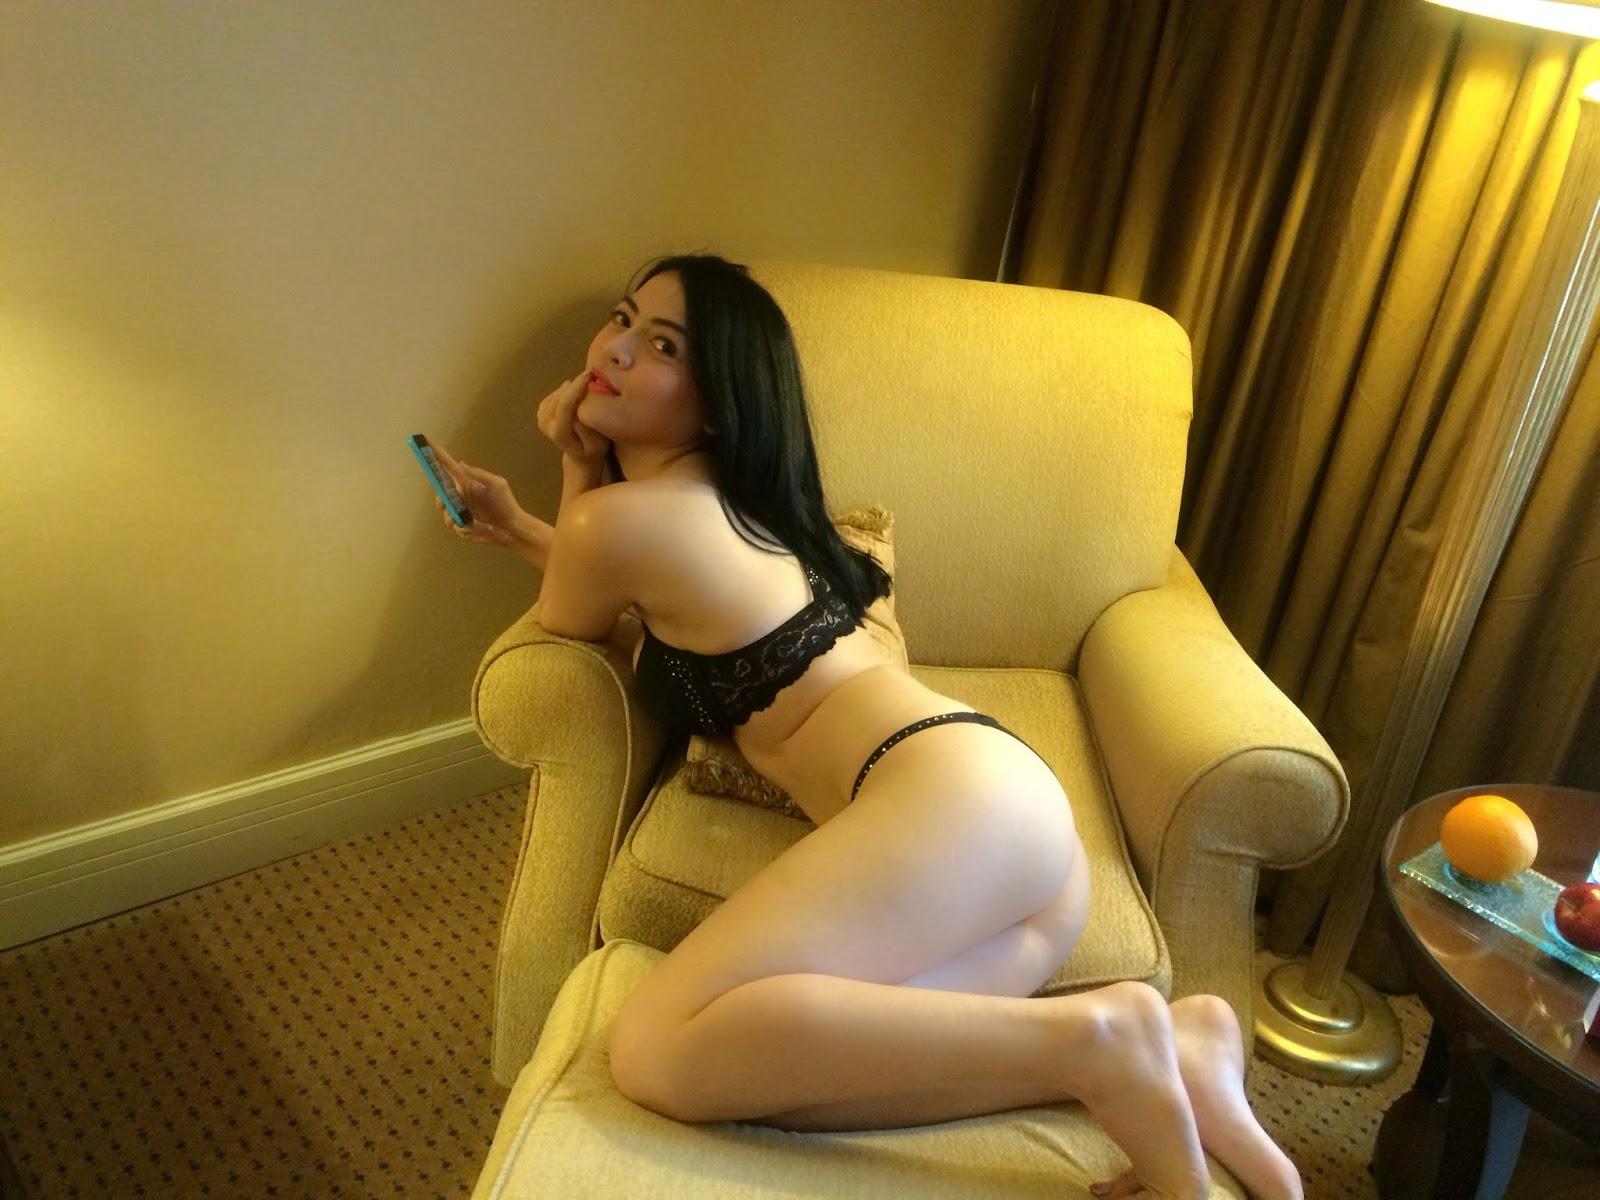 foto nathalie clara abg cantik bugil di kamar hotel   rockoyot